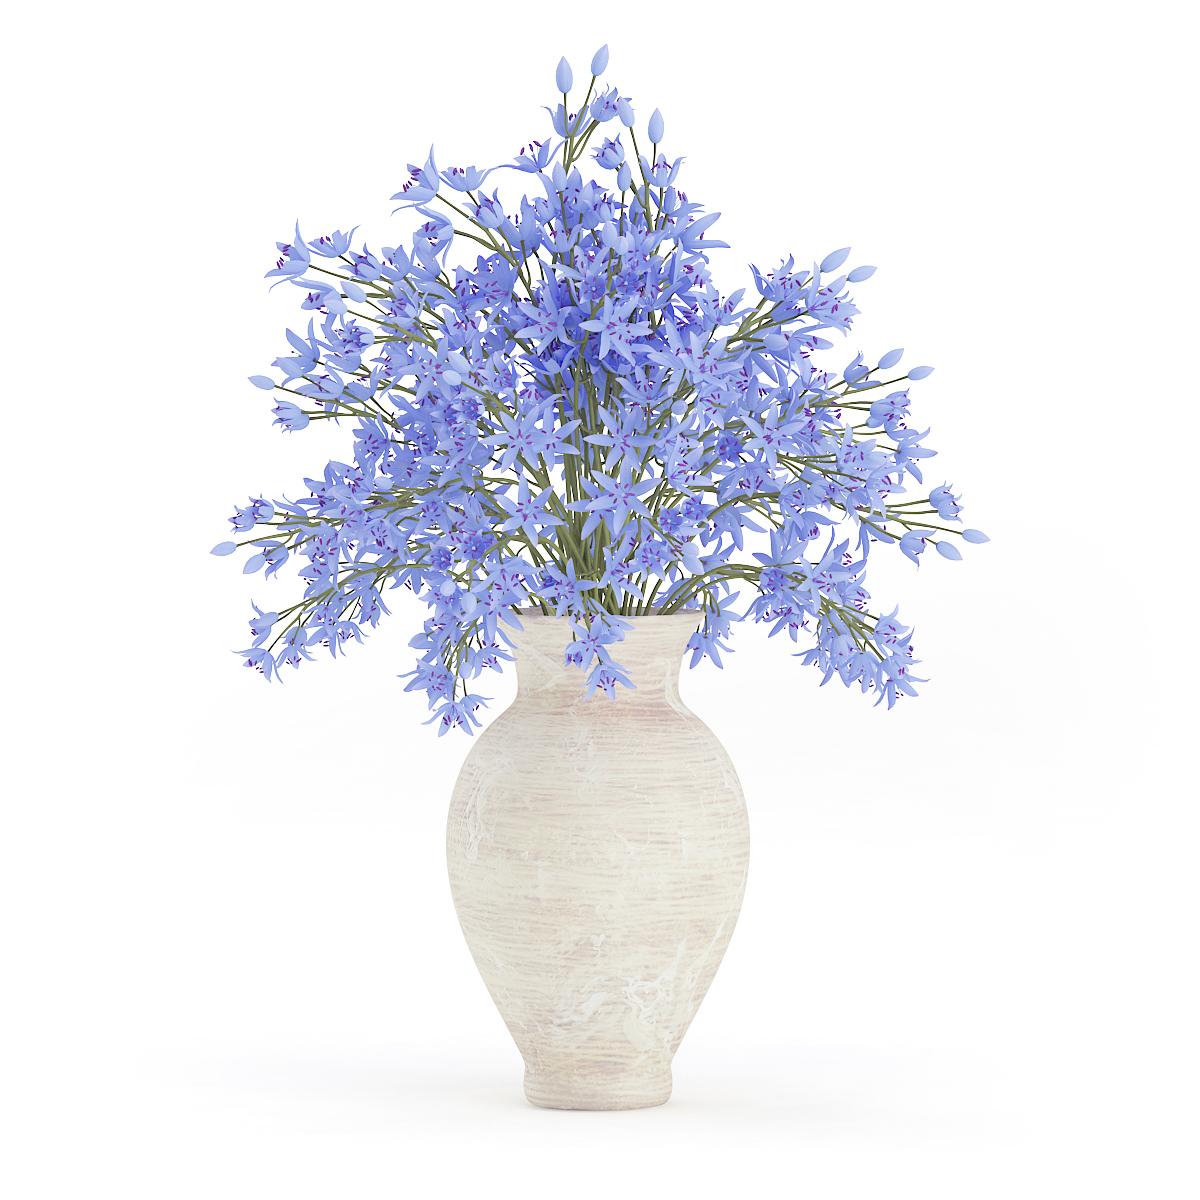 Blue flowers in ceramic vase by cgaxis 3docean cgaxismodels6322a gridg reviewsmspy